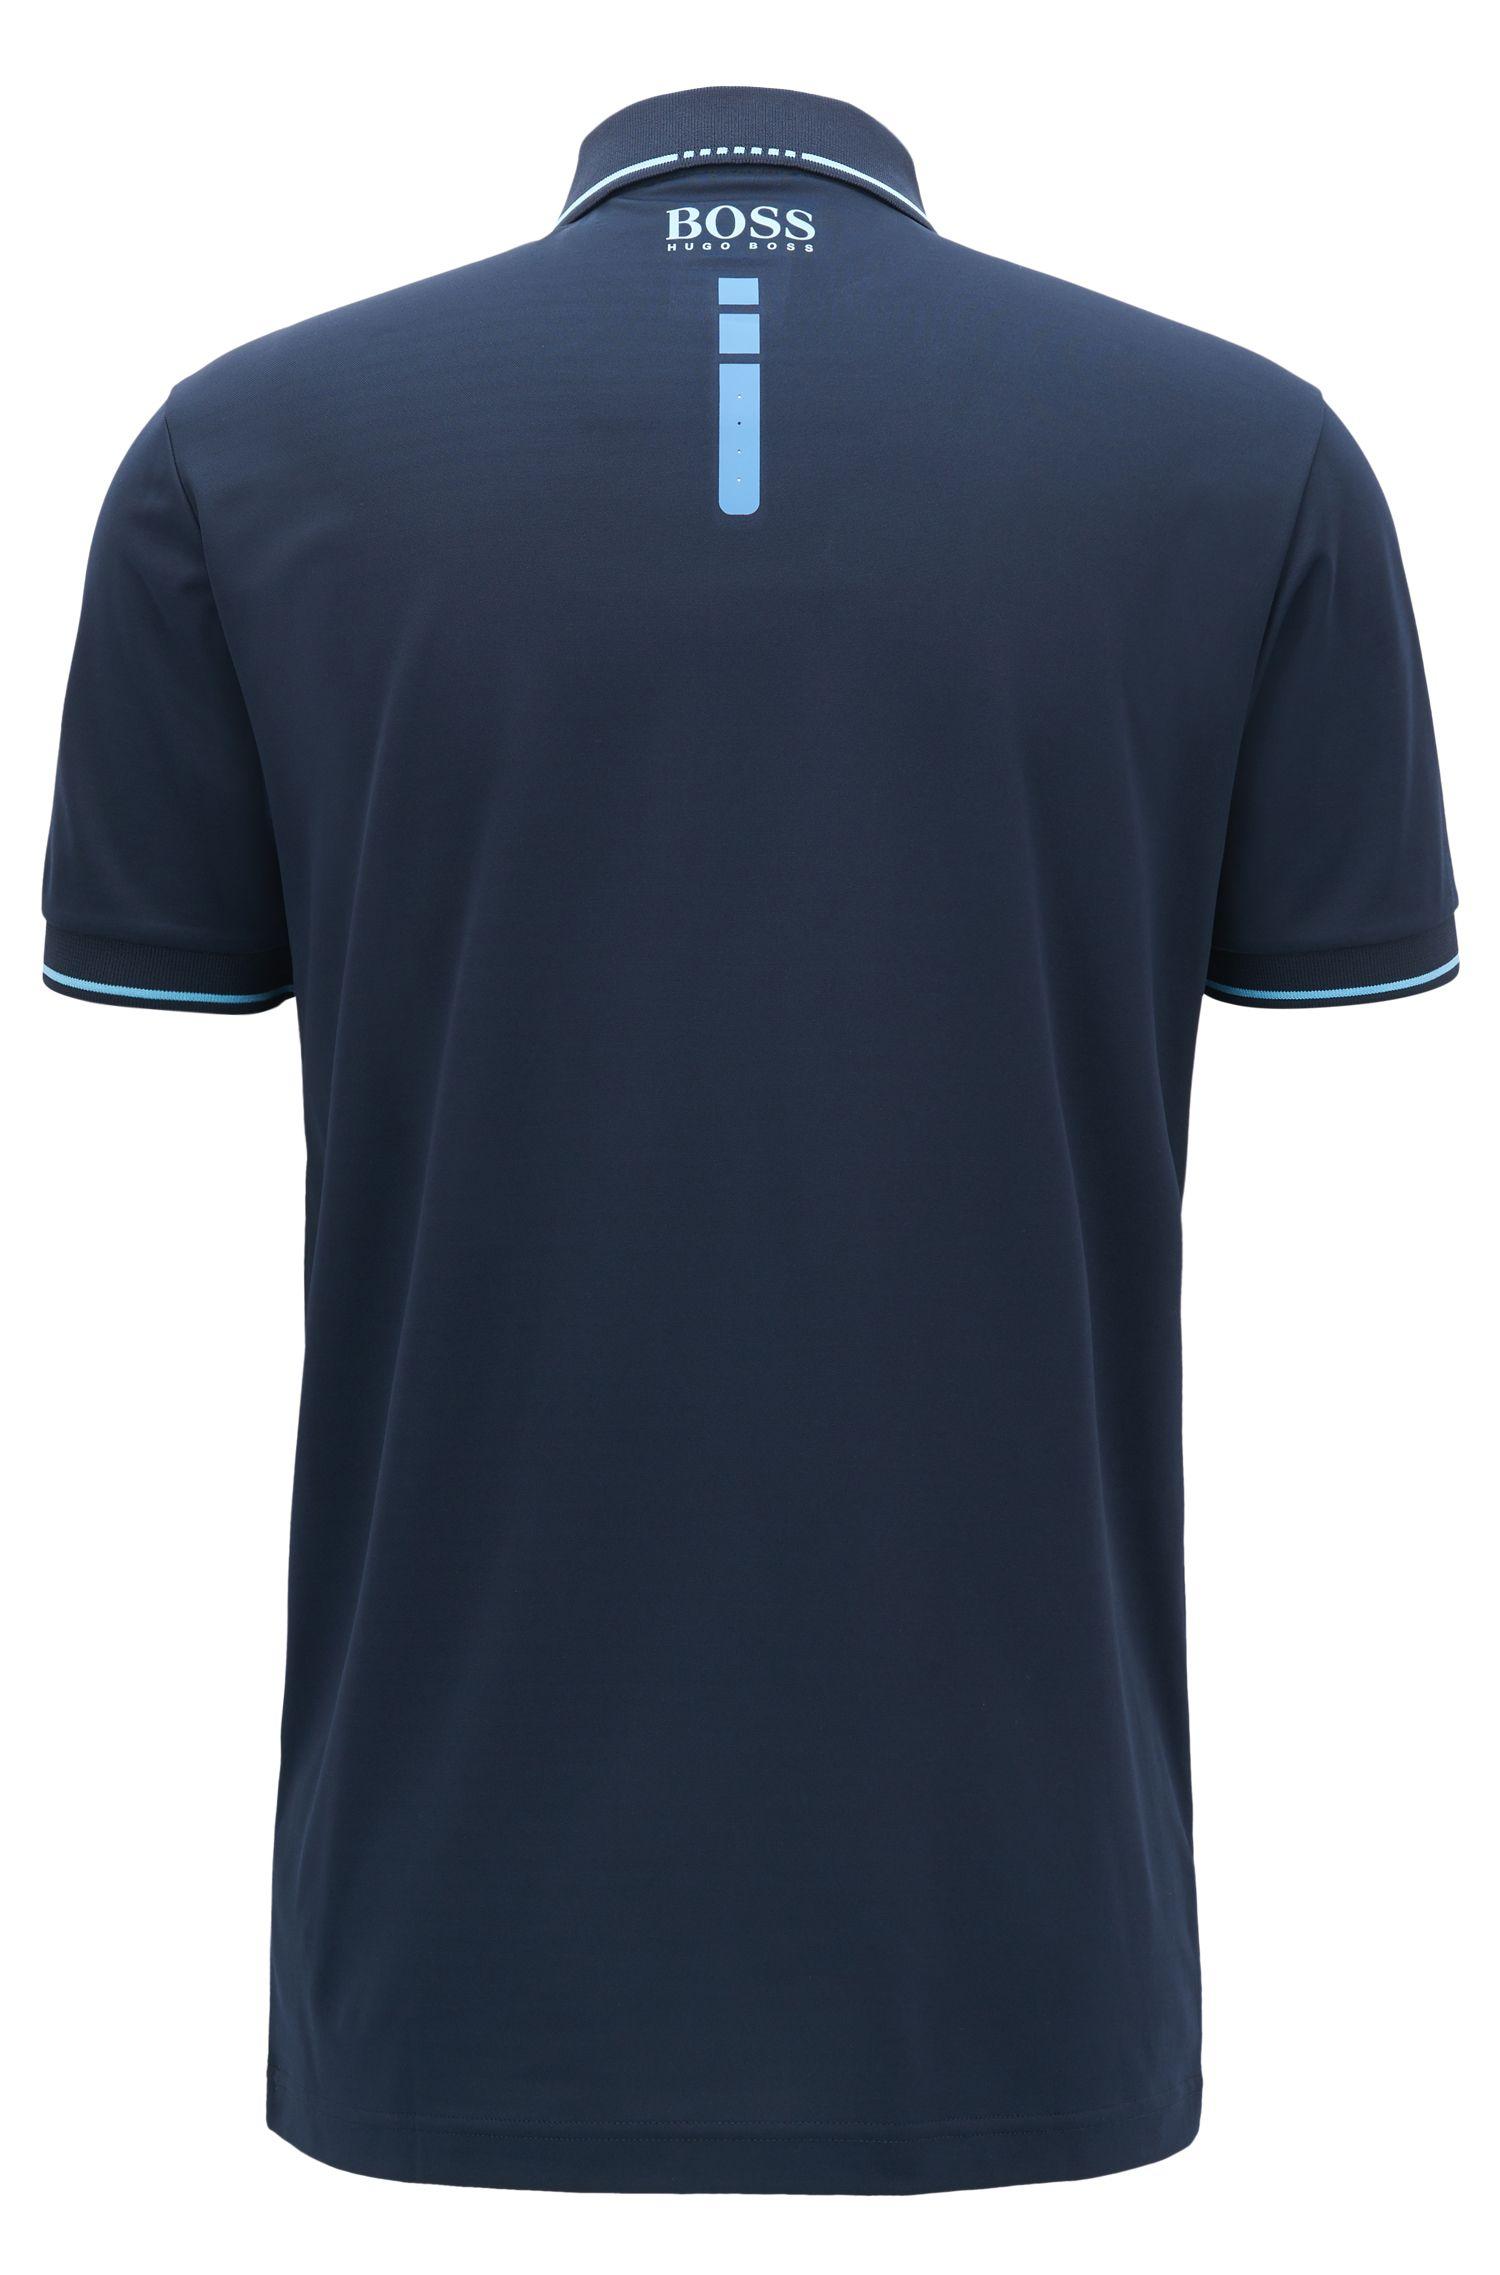 Tipped Polo Shirt, Slim Fit | Paule MK, Dark Blue